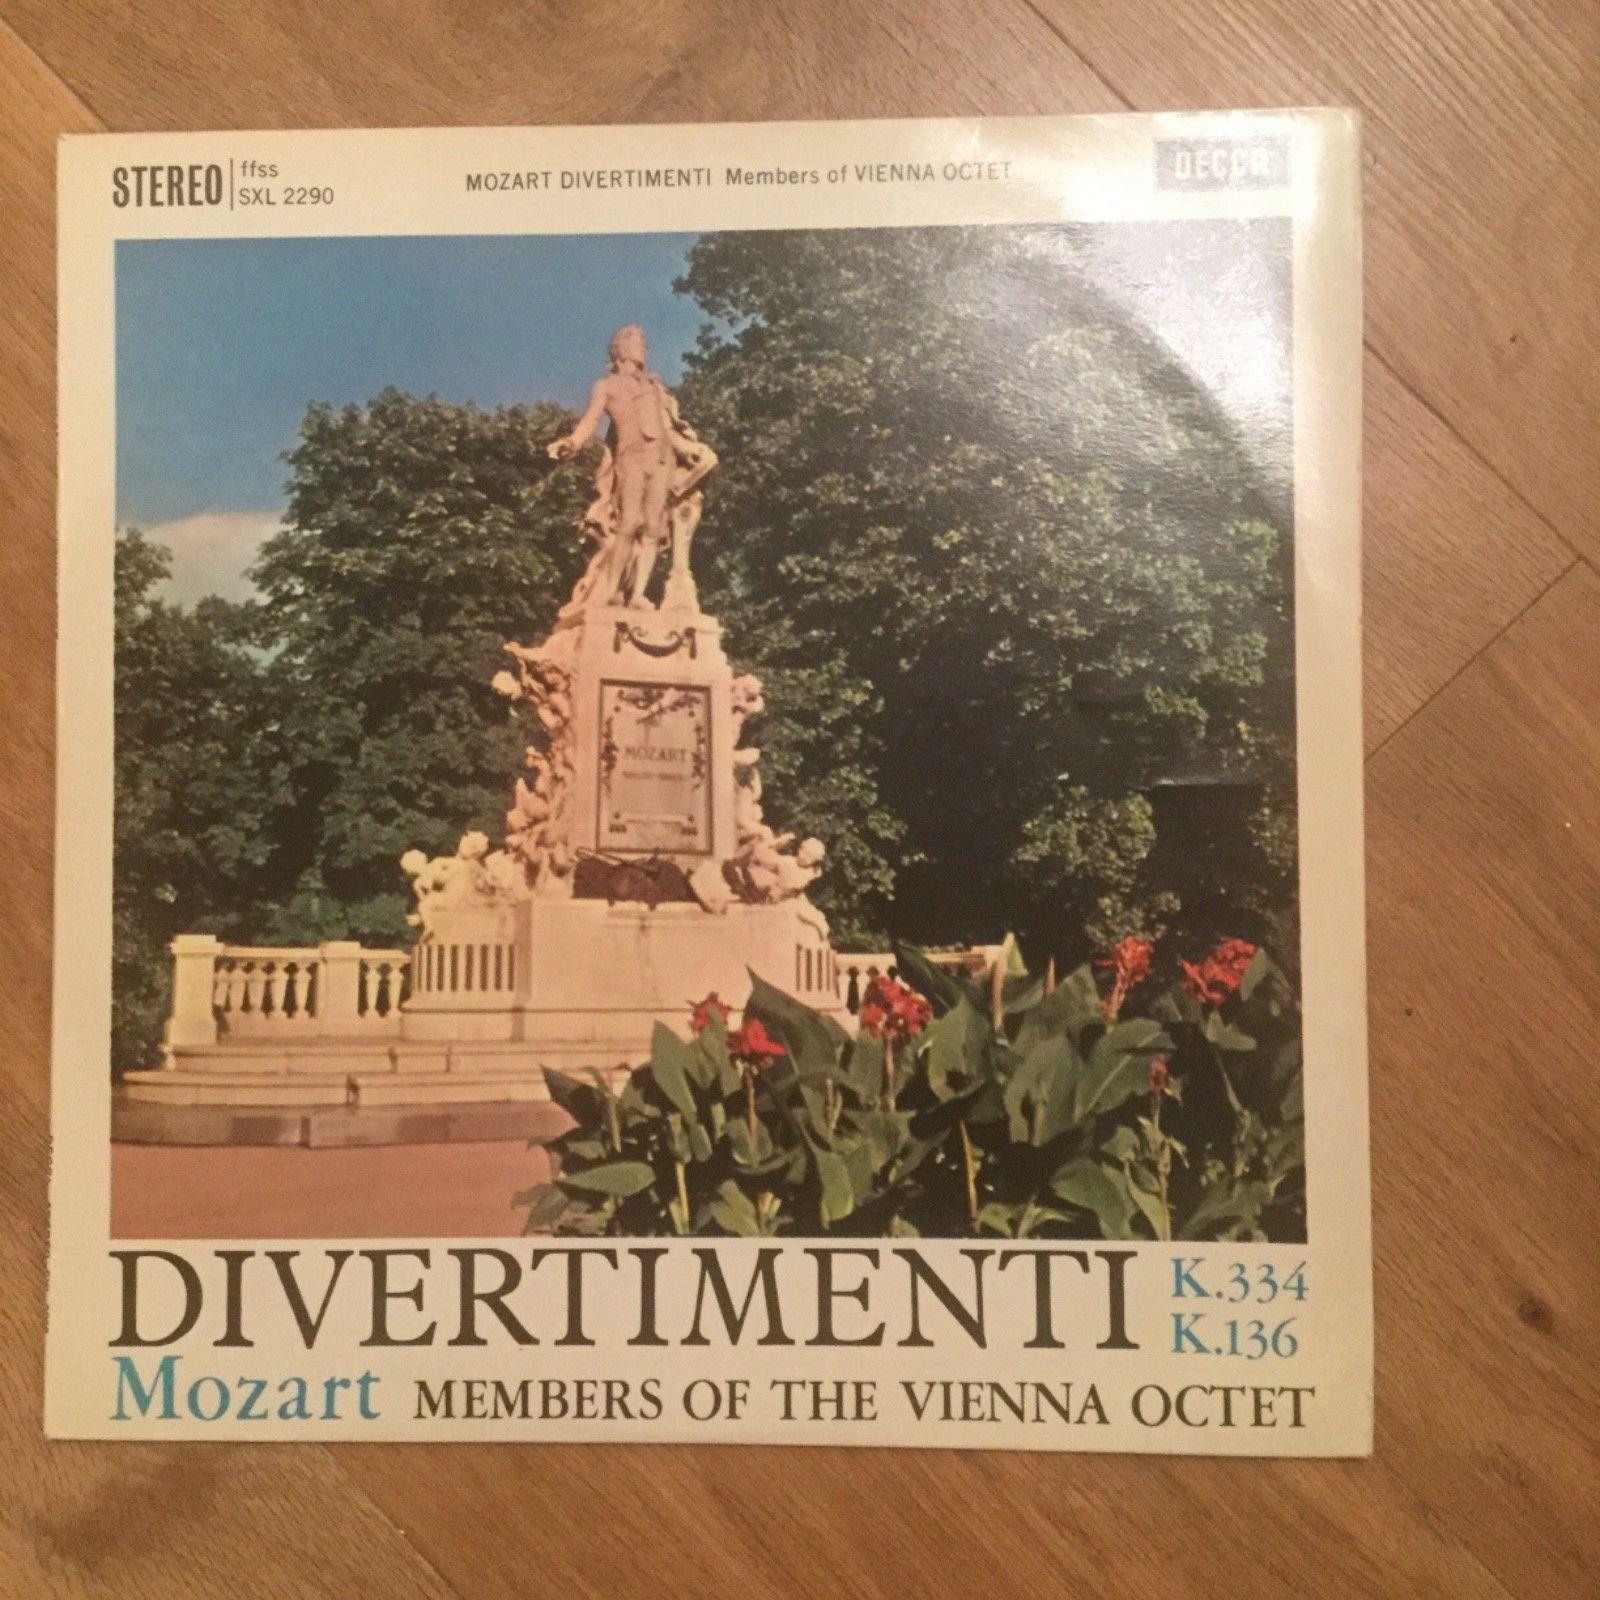 DECCA SXL 2290 WBG ED1 VINYL LP  MOZART DIVERTIMENTI VIENNA OCTET